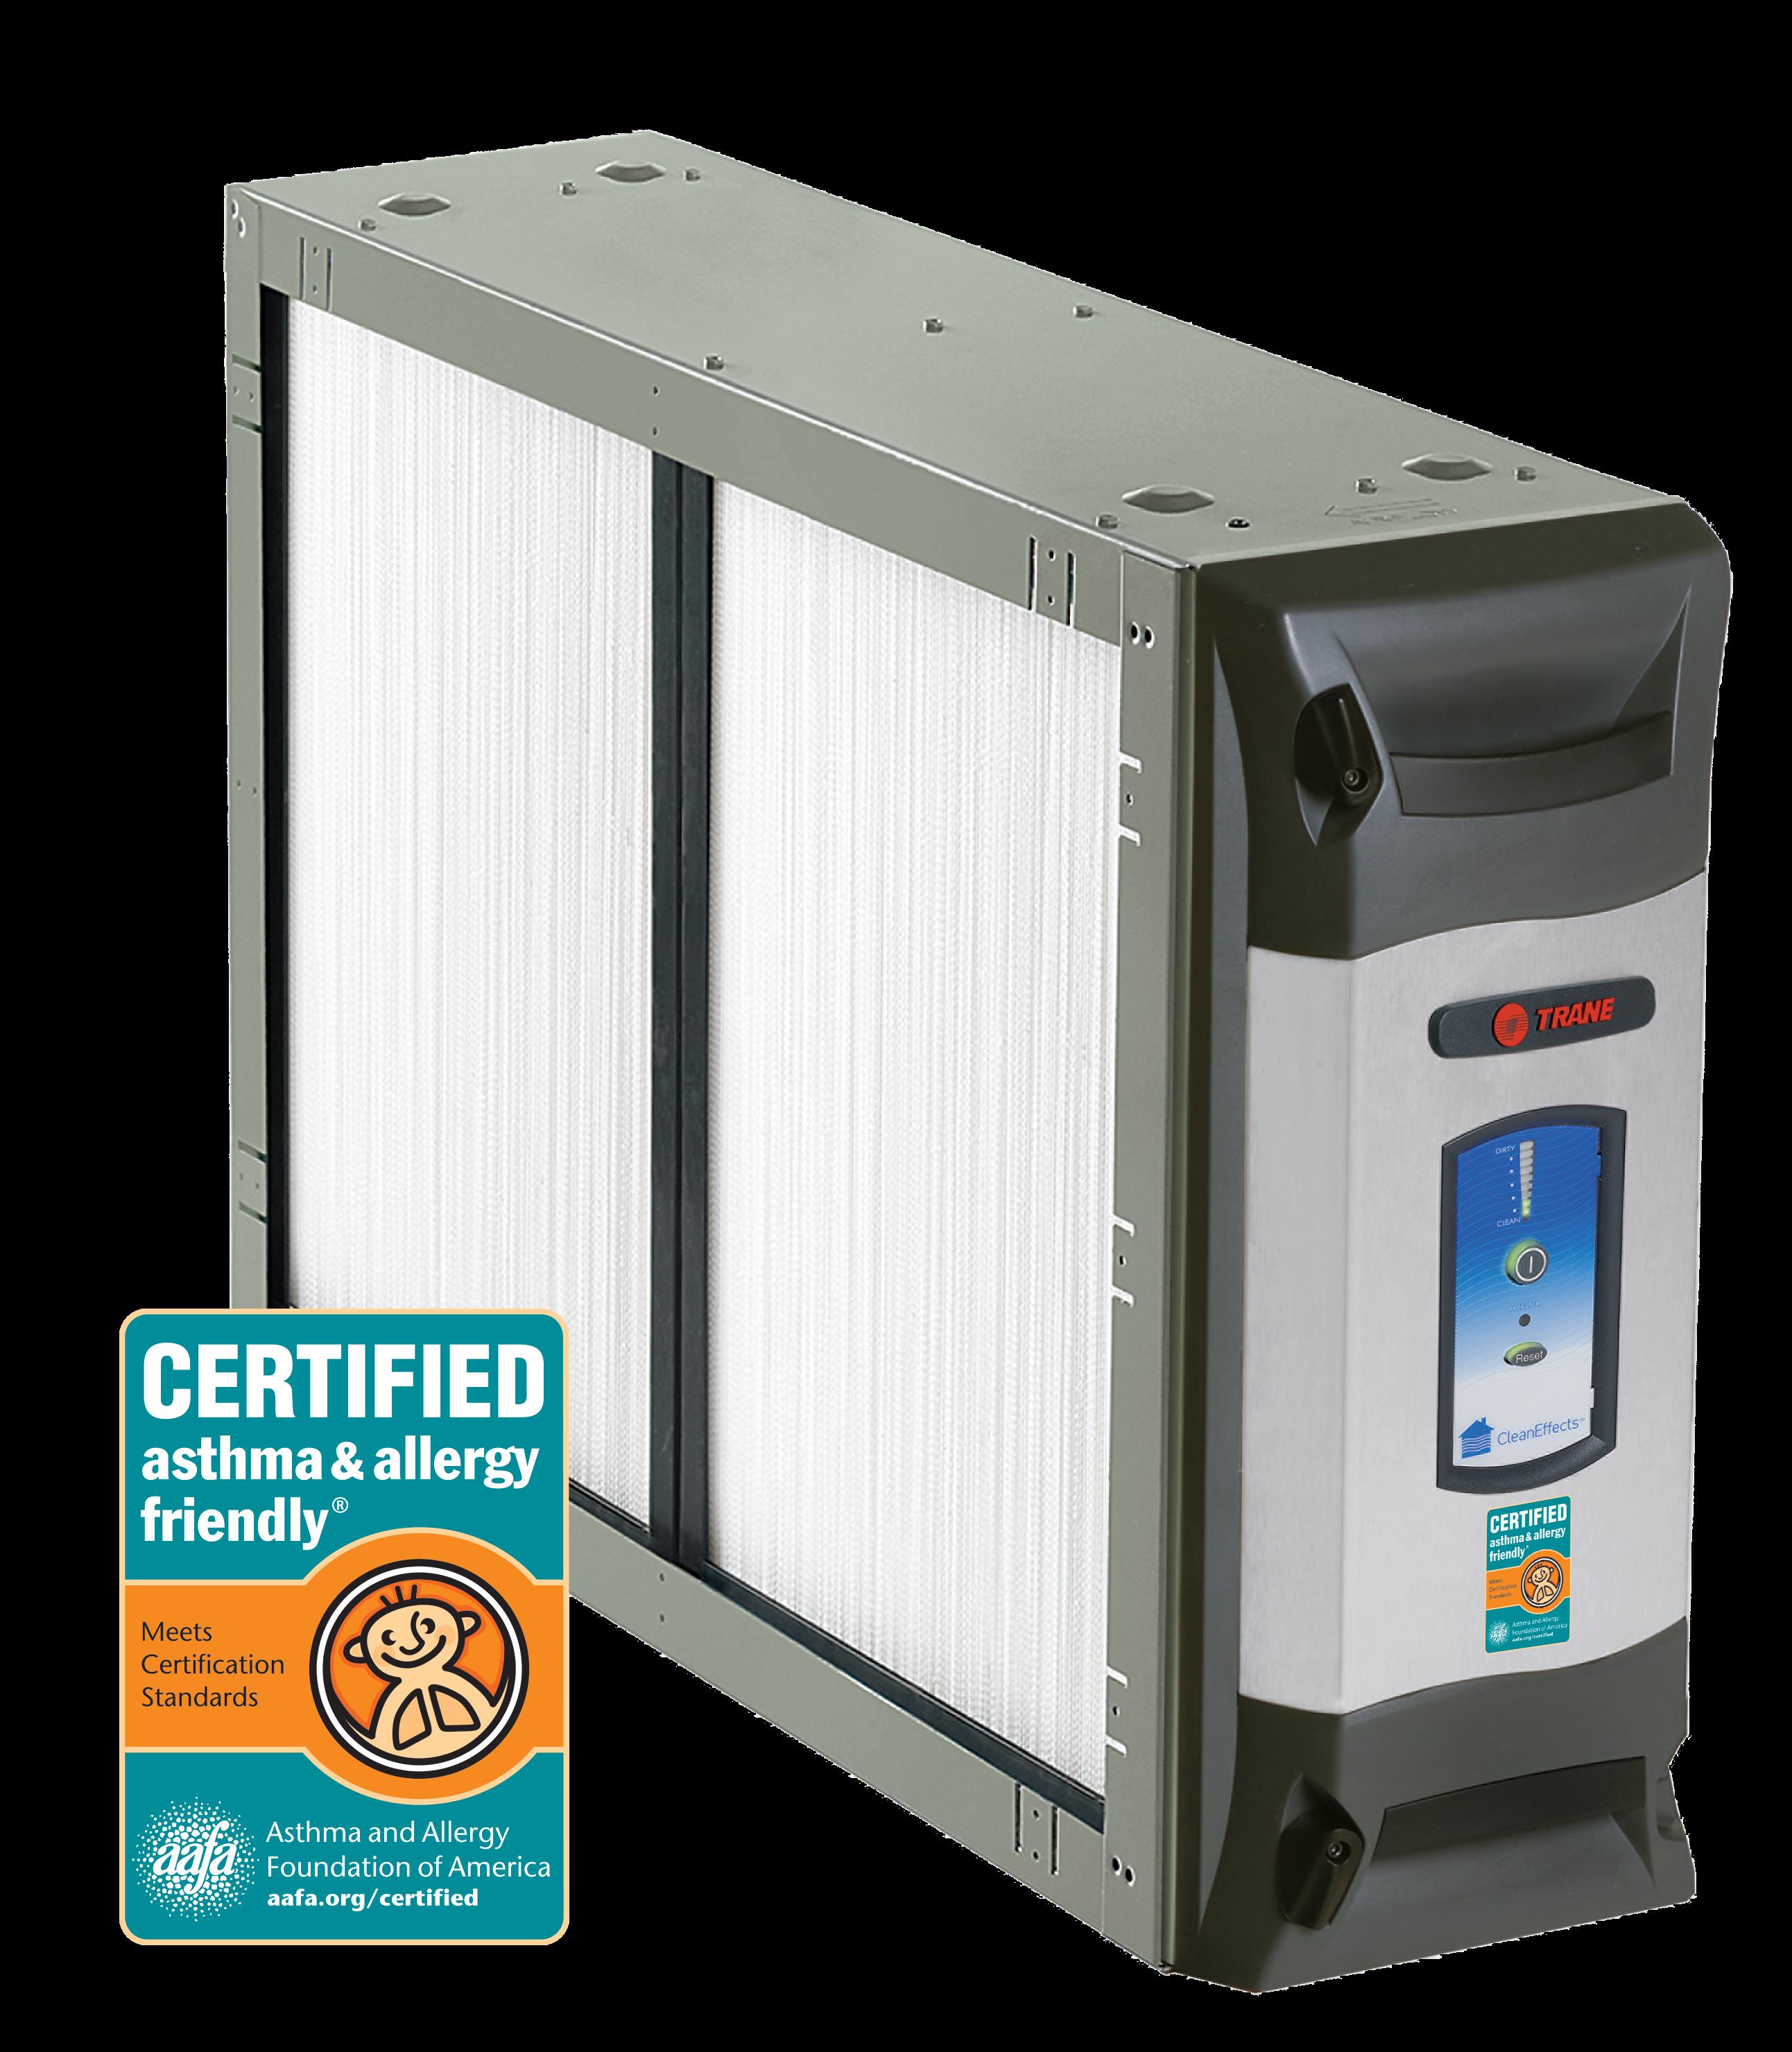 Trane Cleaneffects: Trane Air Quality